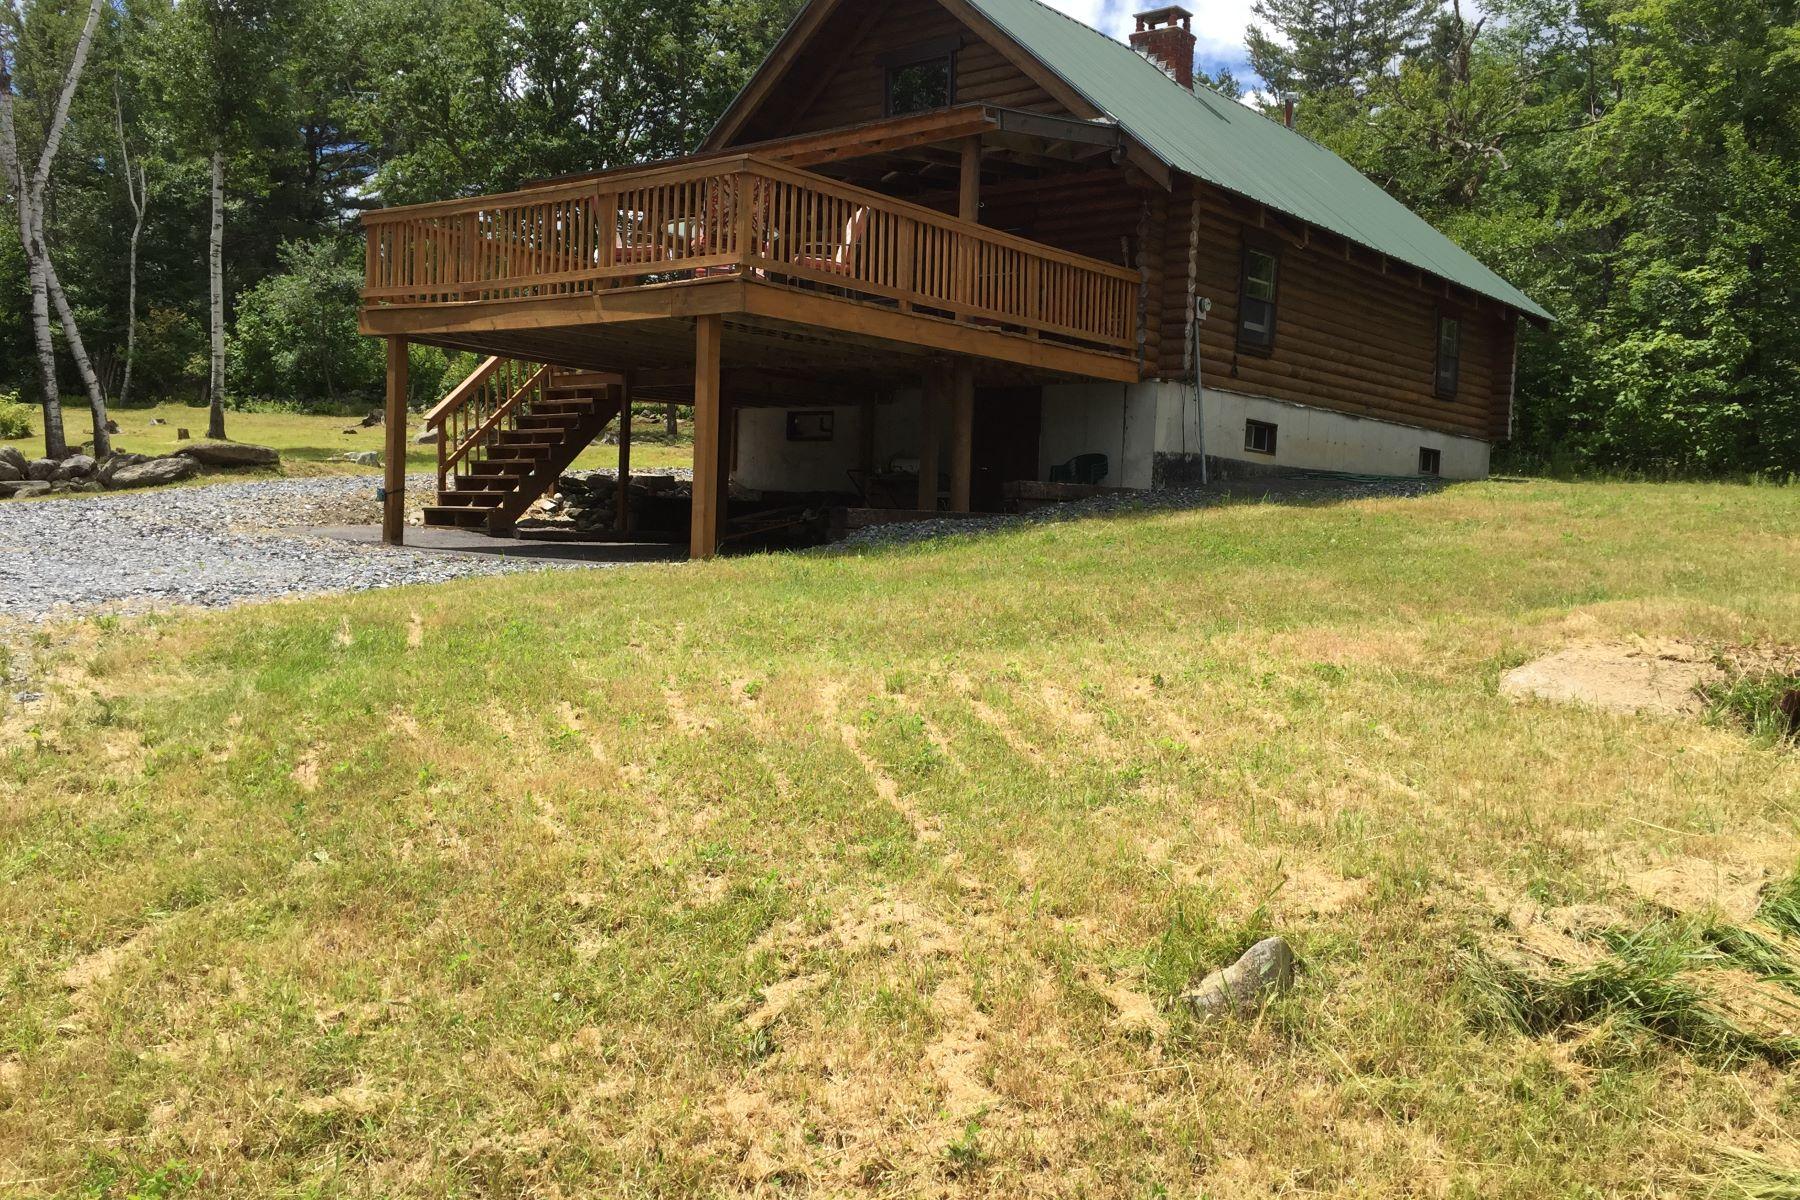 واحد منزل الأسرة للـ Sale في 74 South Rd, Lempster Lempster, New Hampshire, 03605 United States